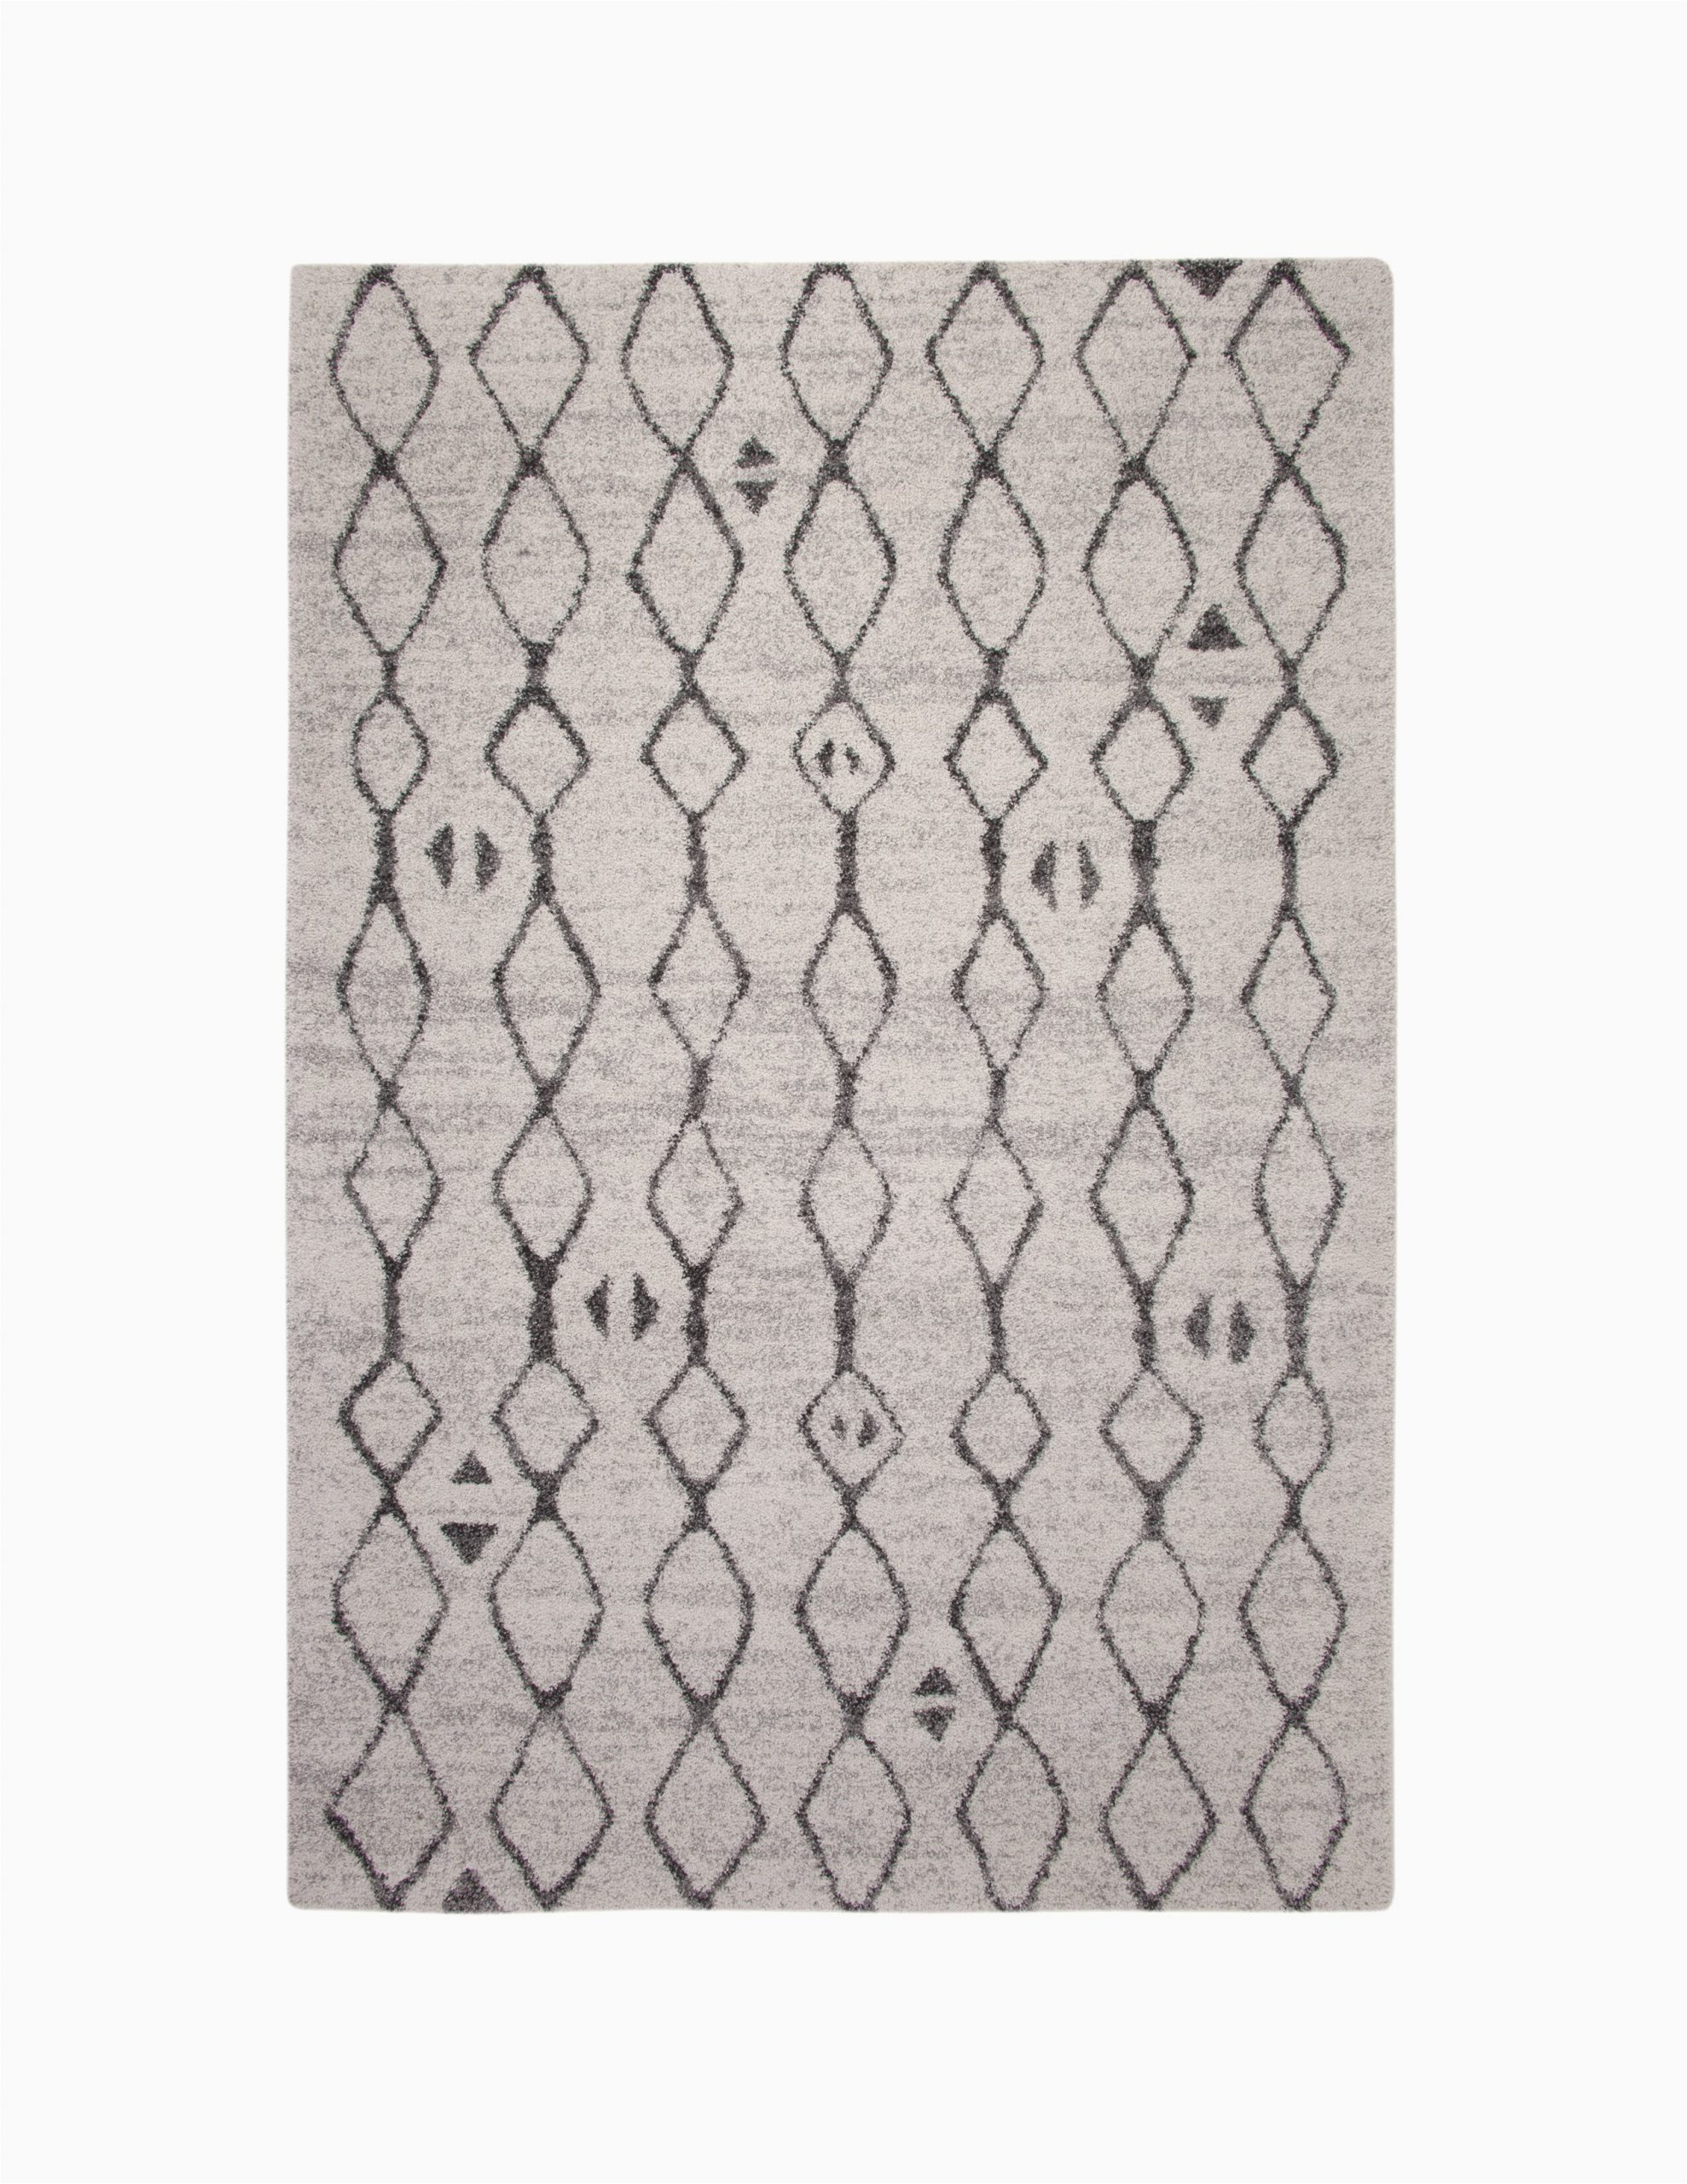 adamsburg geometric ivorycharcoal area rug